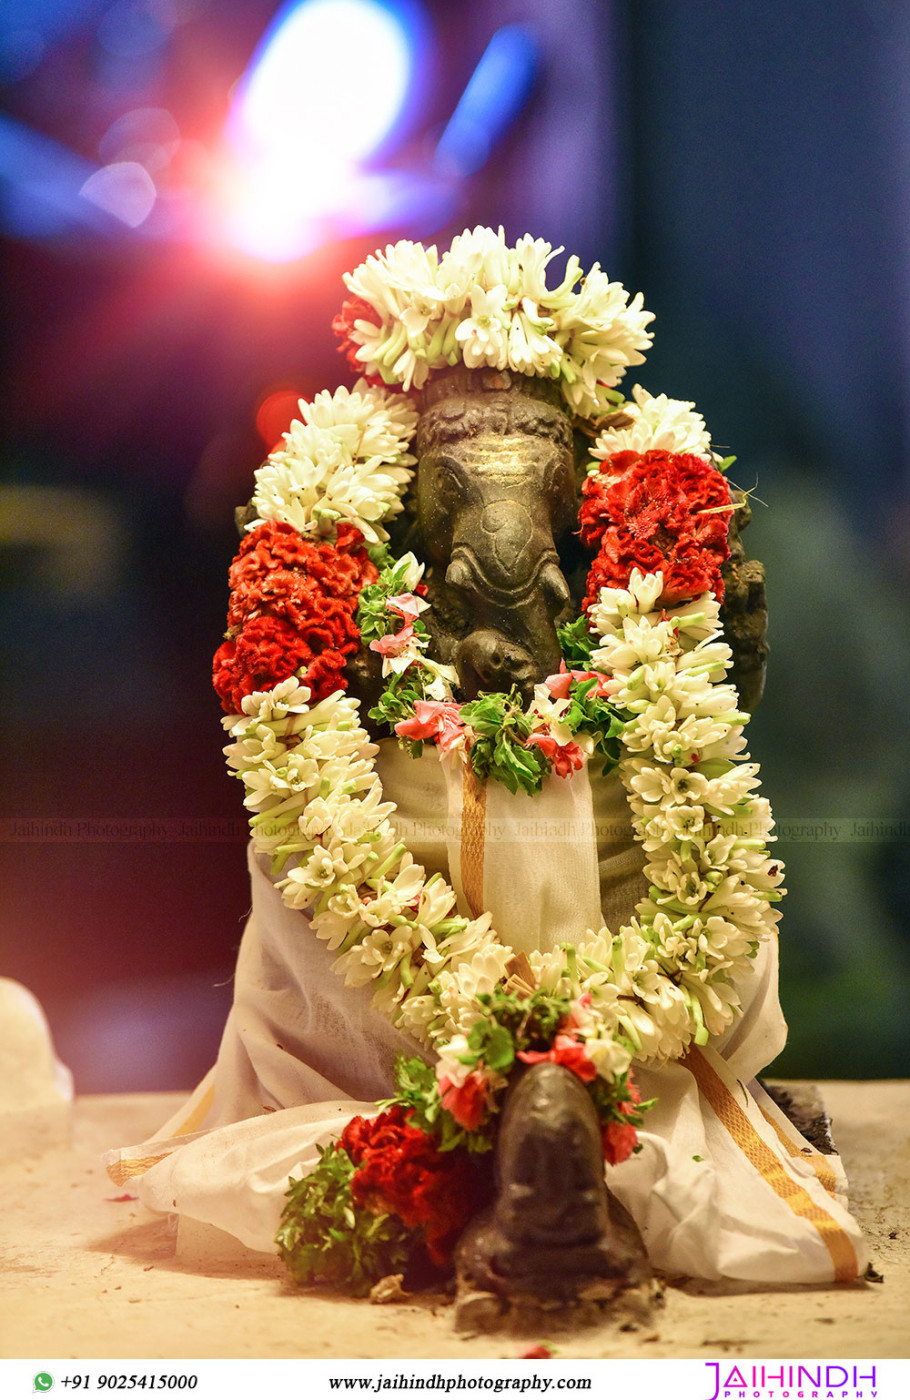 Best Professional Candid Photographer In Madurai 10